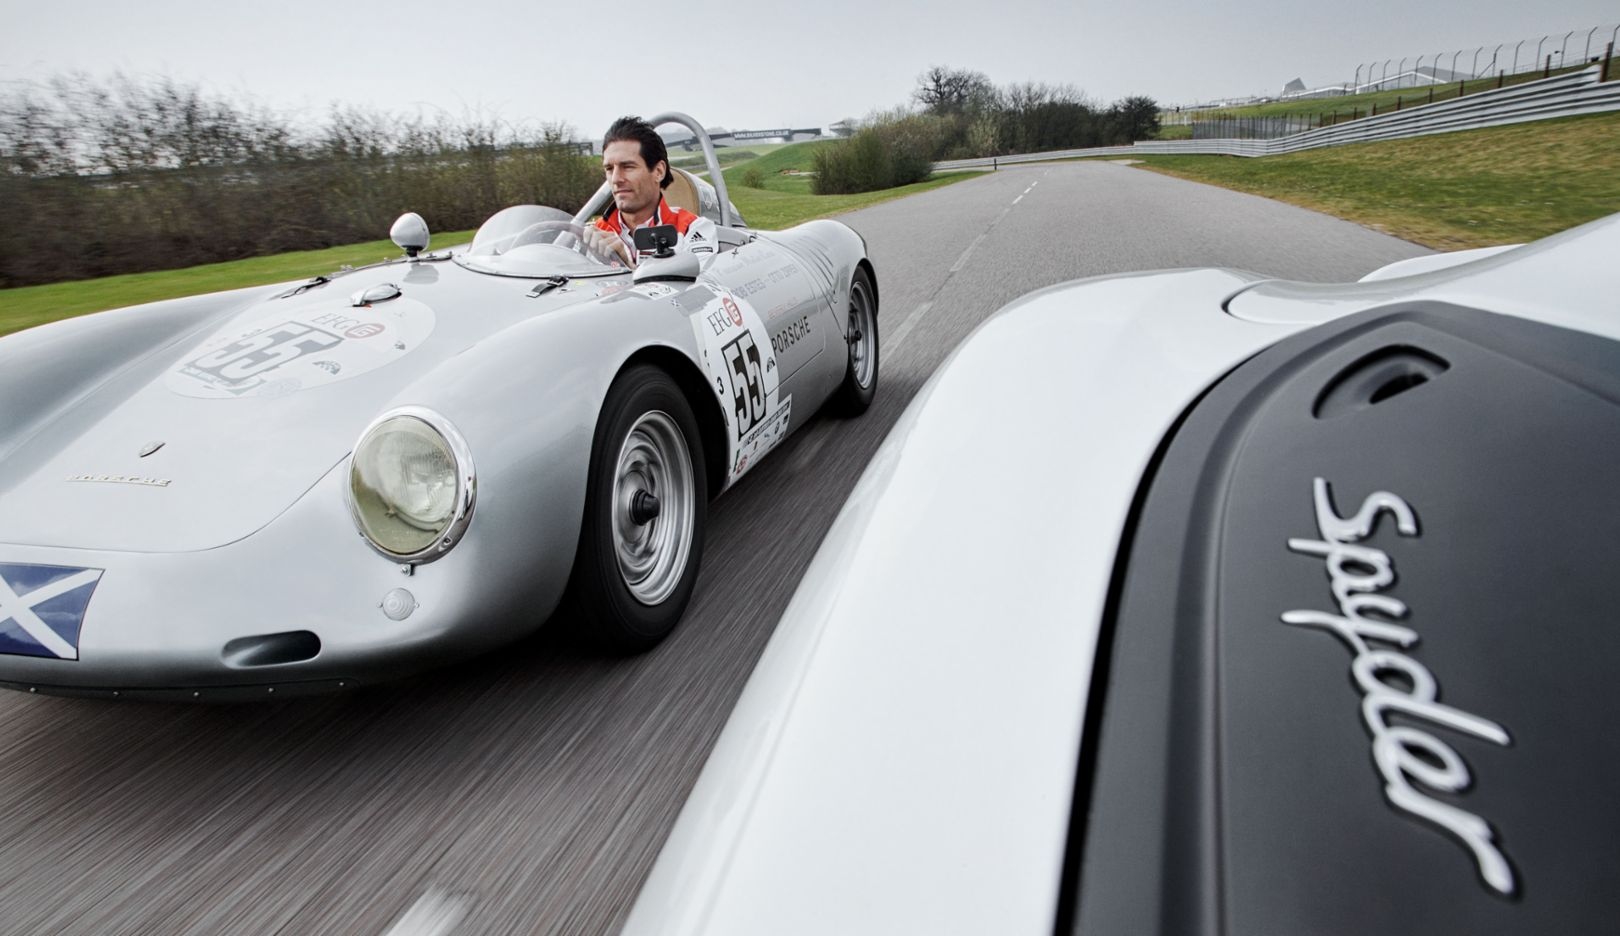 Mark Webber, Porsche 550 Spyder, Porsche Boxster Spyder, Porsche AG